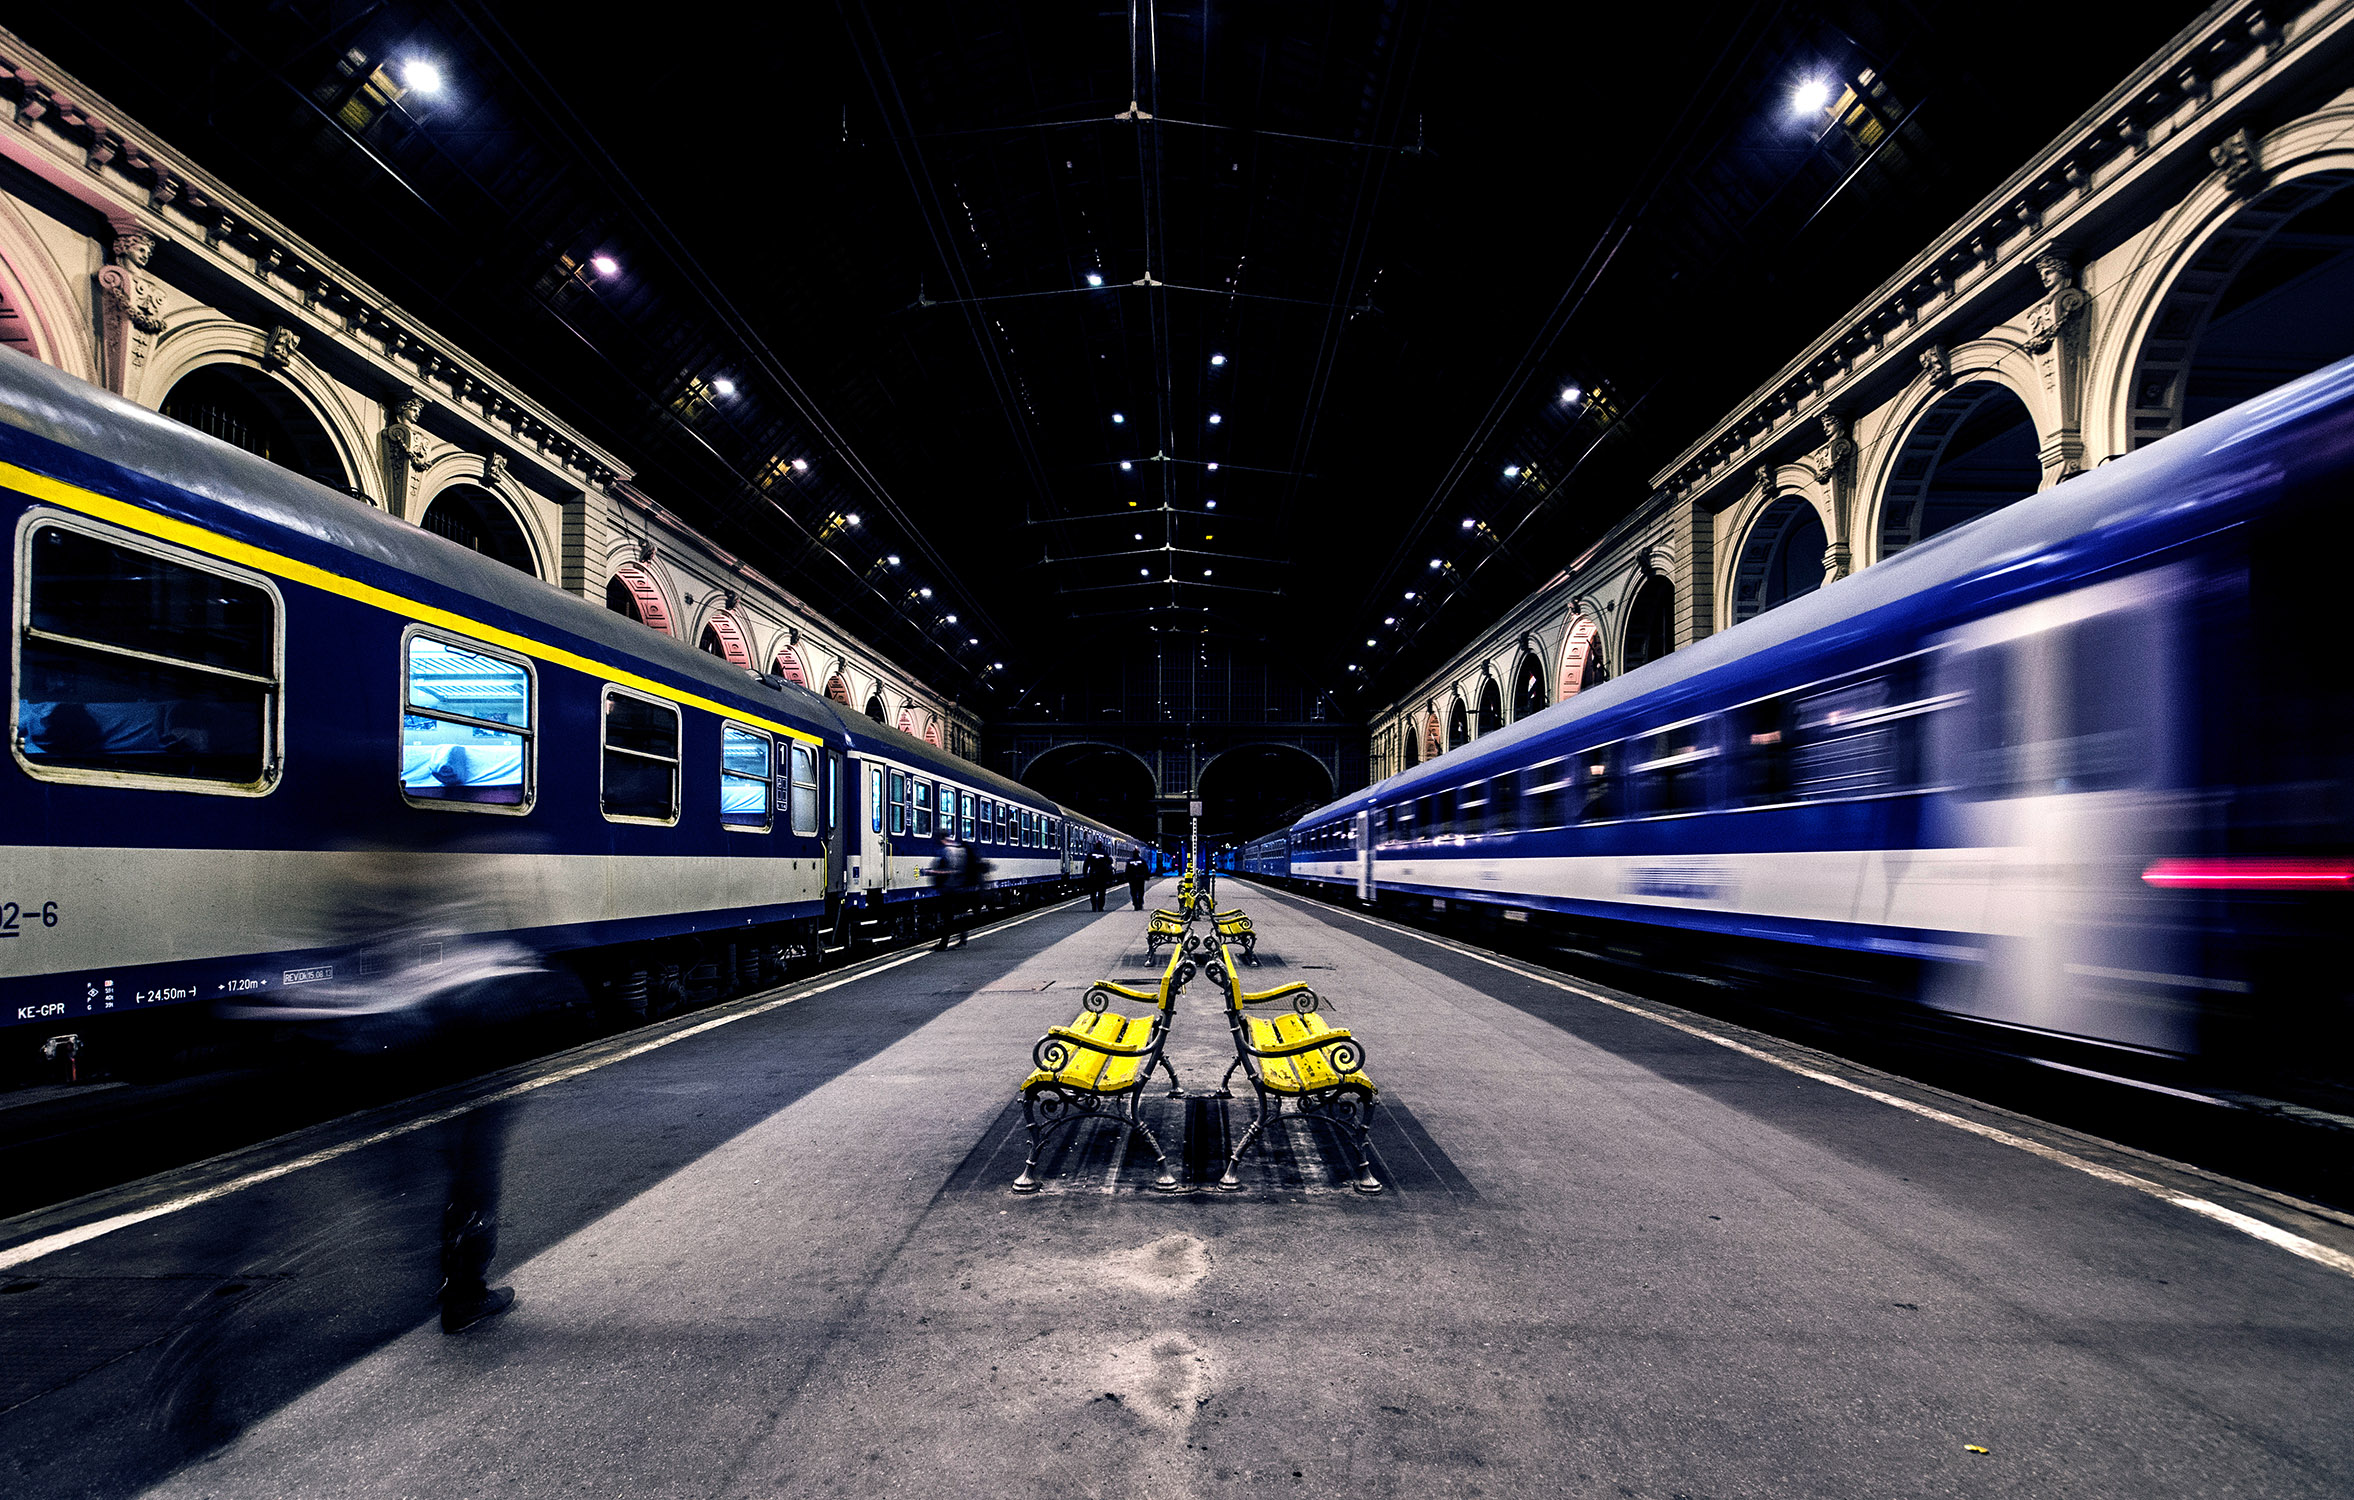 budapestst1.jpg